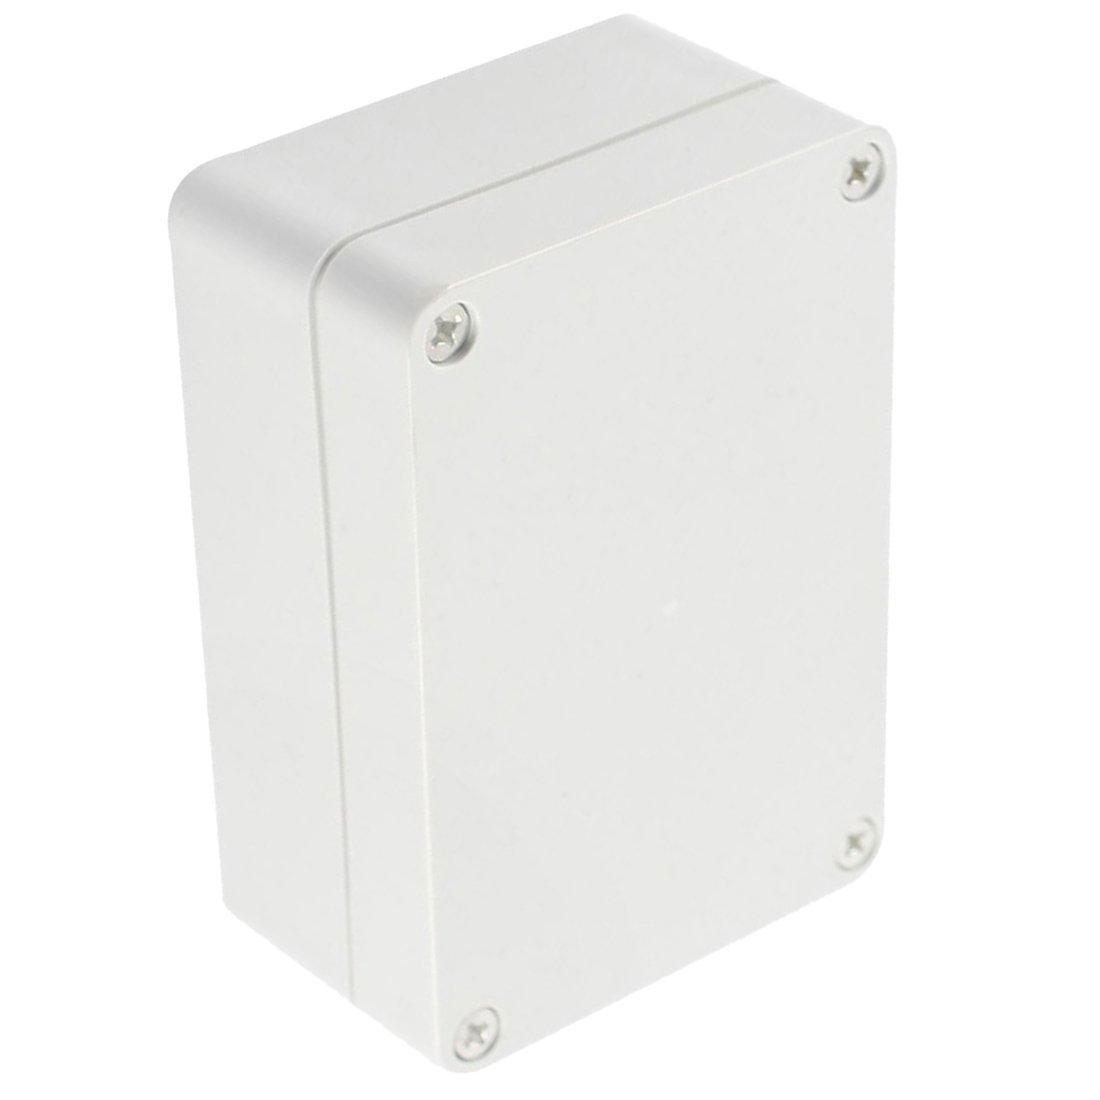 REFURBISHHOUSE Caja de proyecto electronico de conexiones de plastica de cubierta transparente impermeable 82x58x35mm